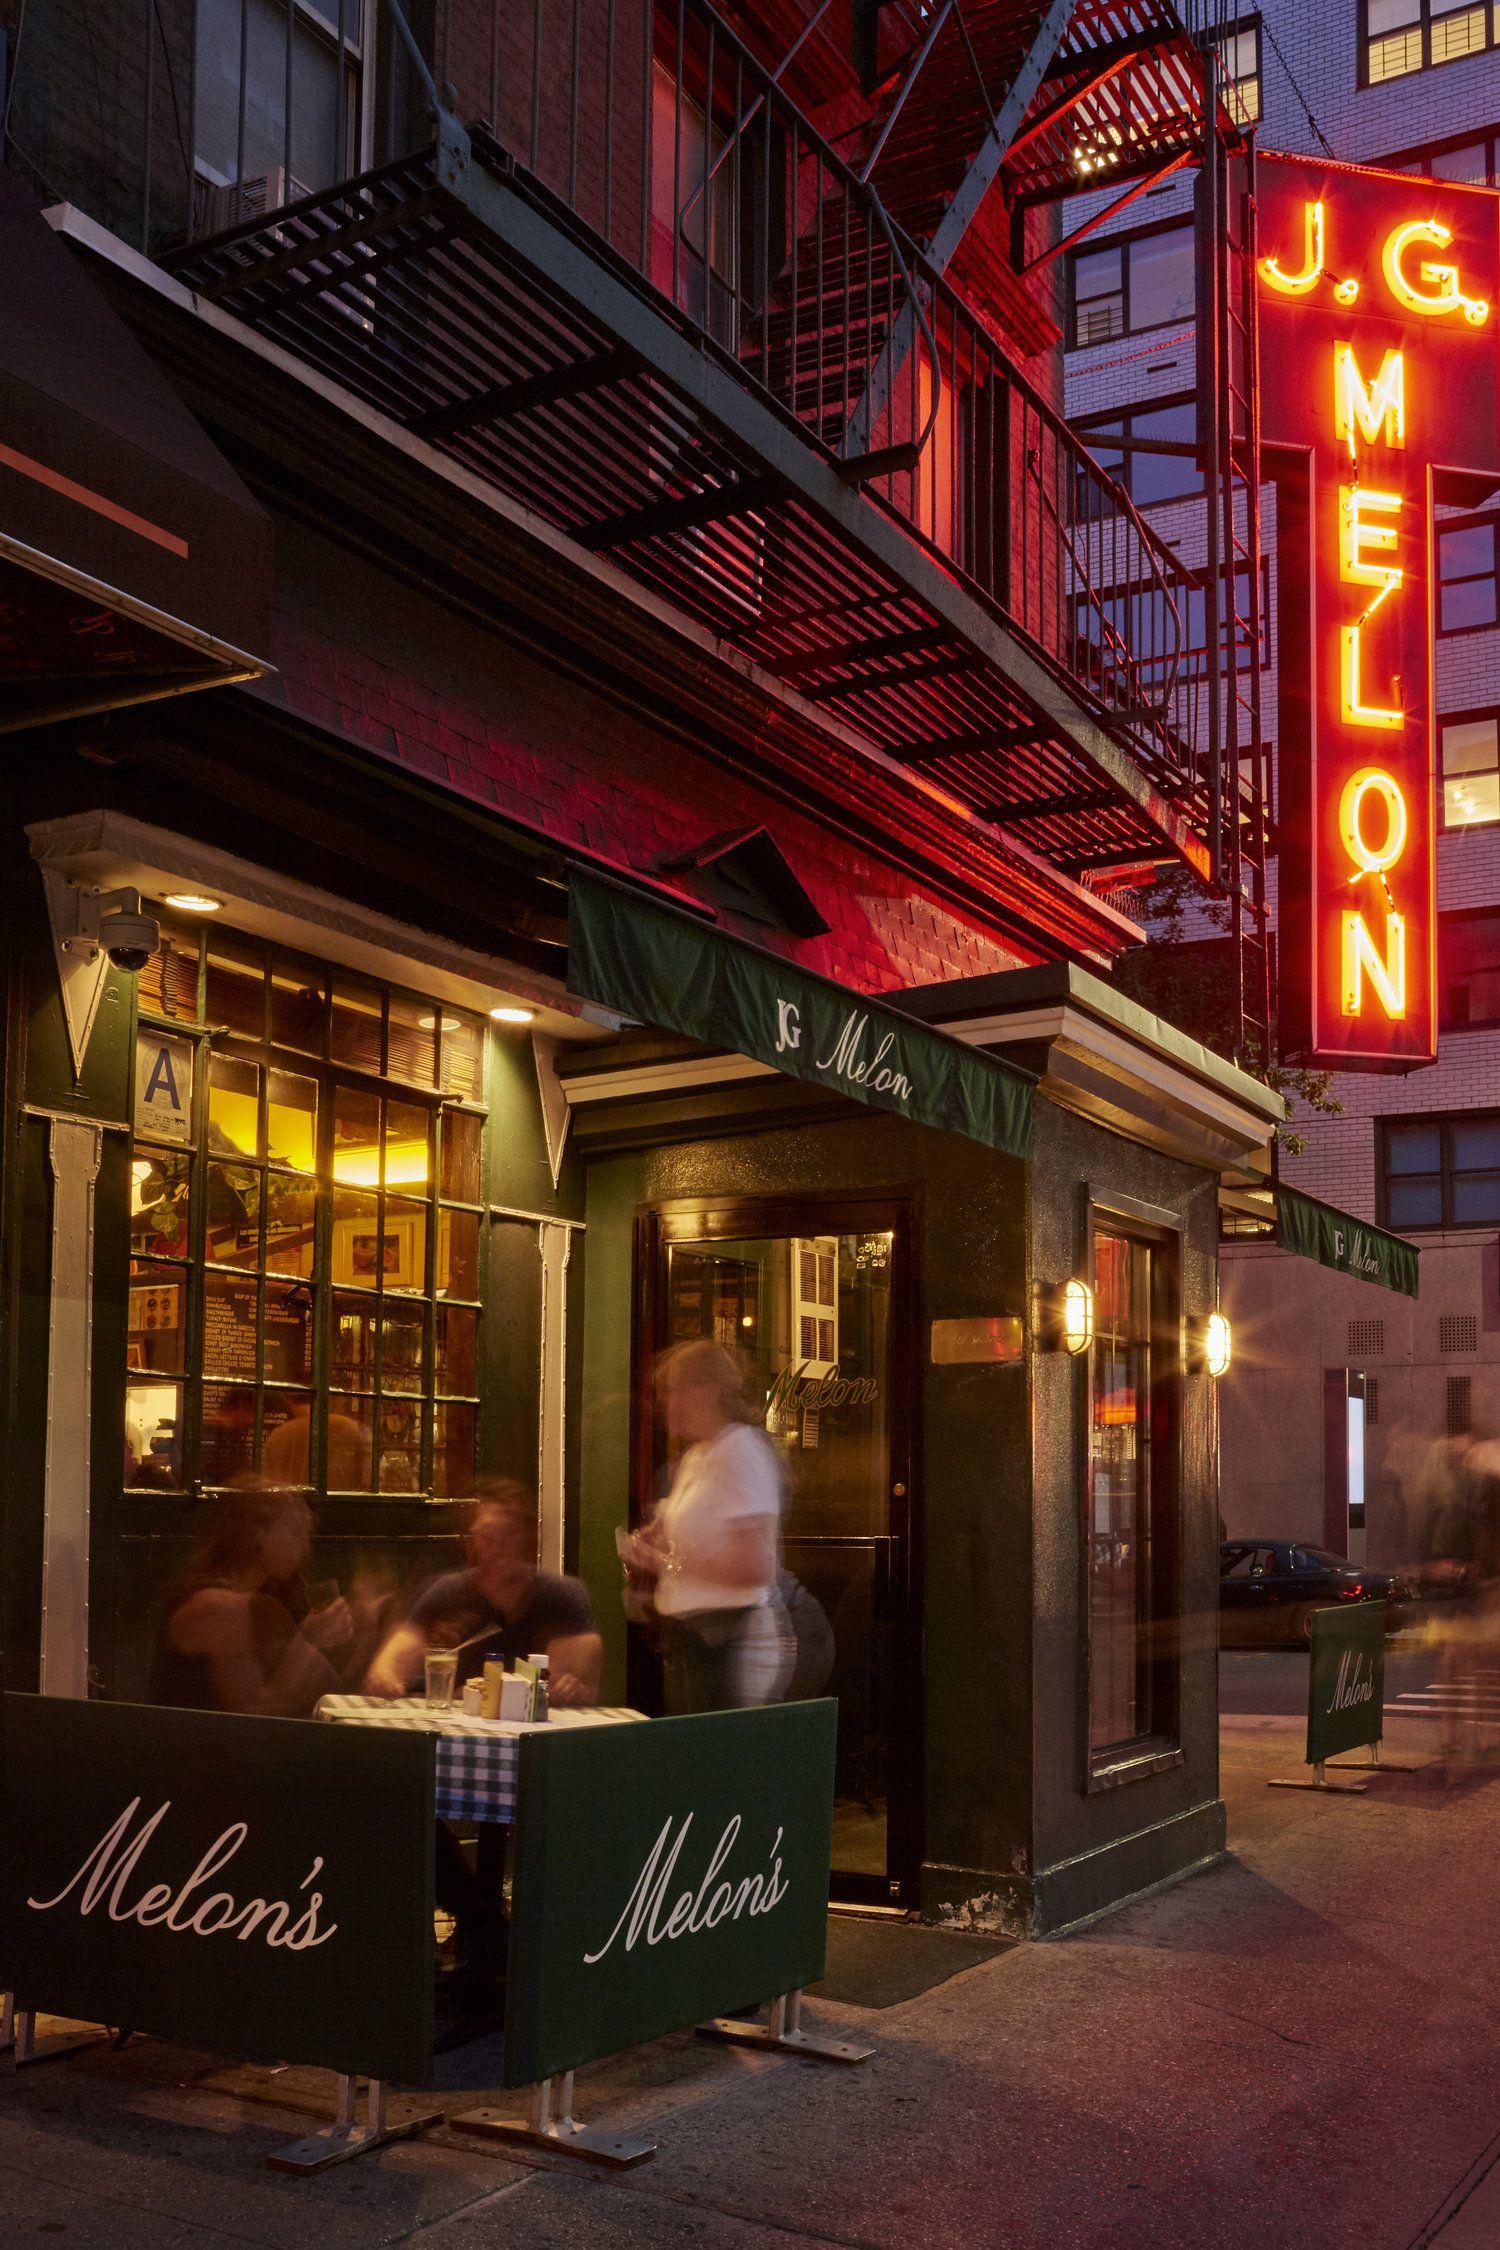 Nyc trip image by MurphGuide on NYC Bars & Restaurants